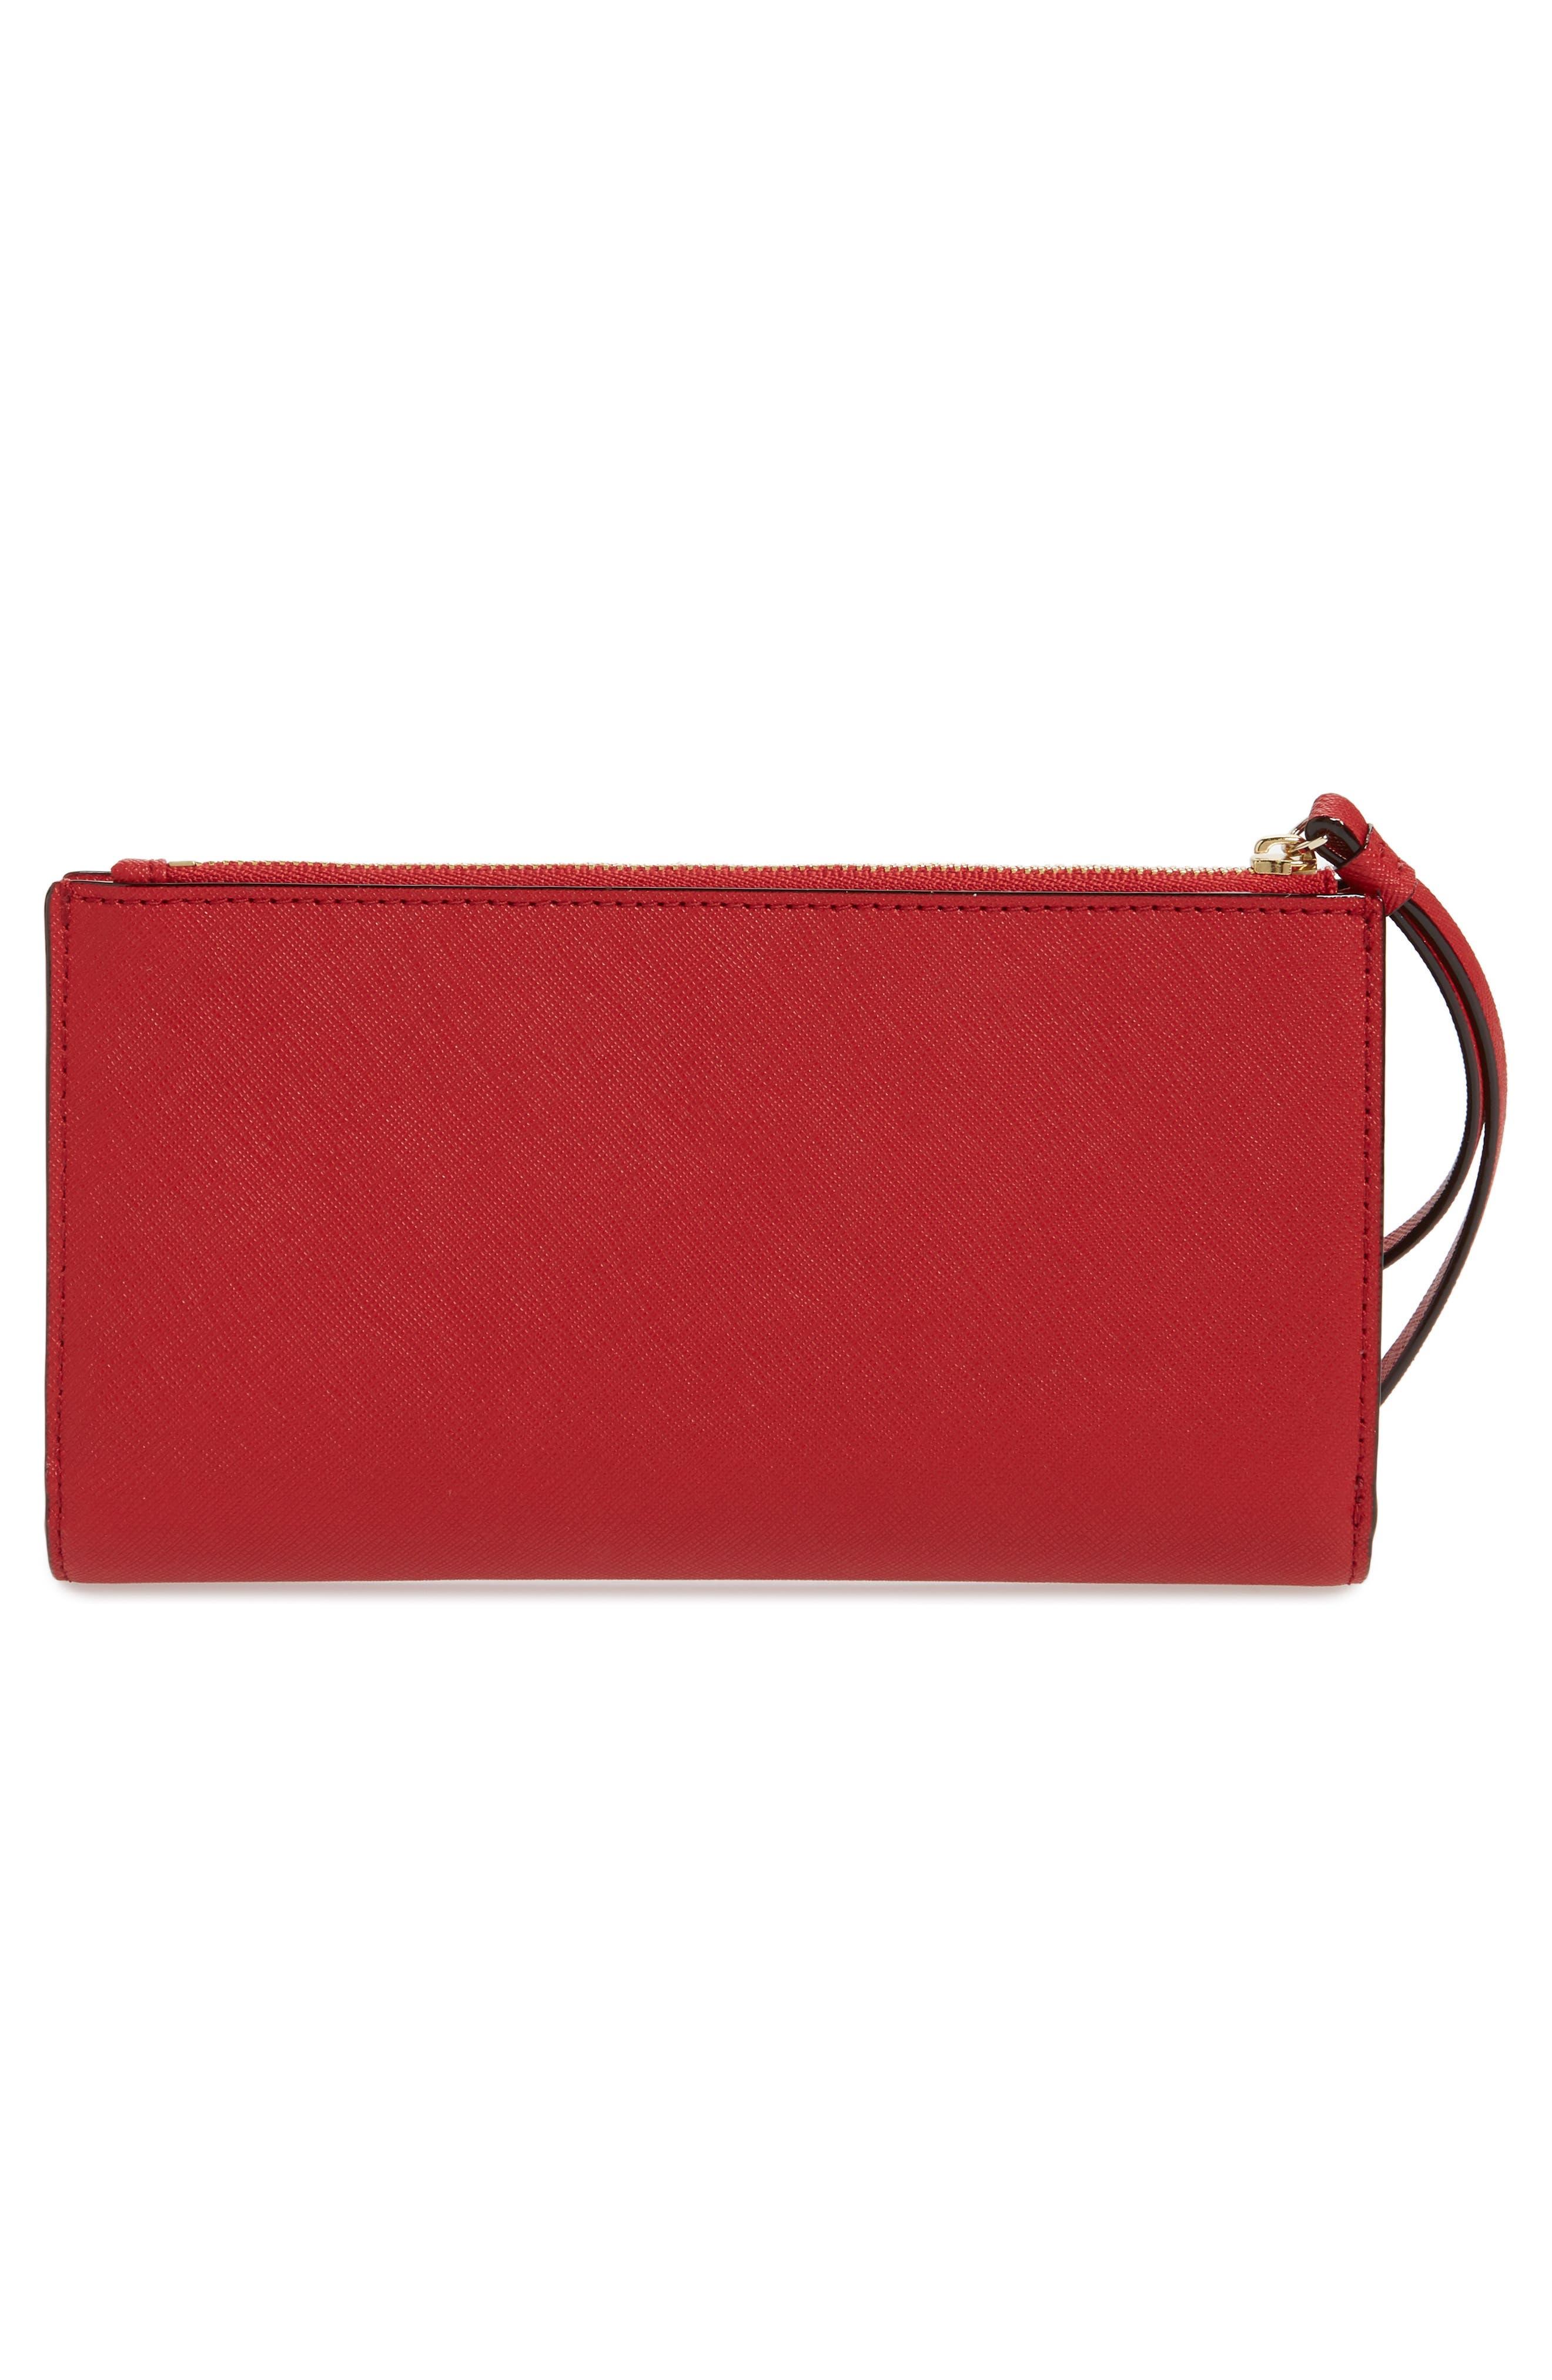 cameron street - eliza leather wallet,                             Alternate thumbnail 3, color,                             602